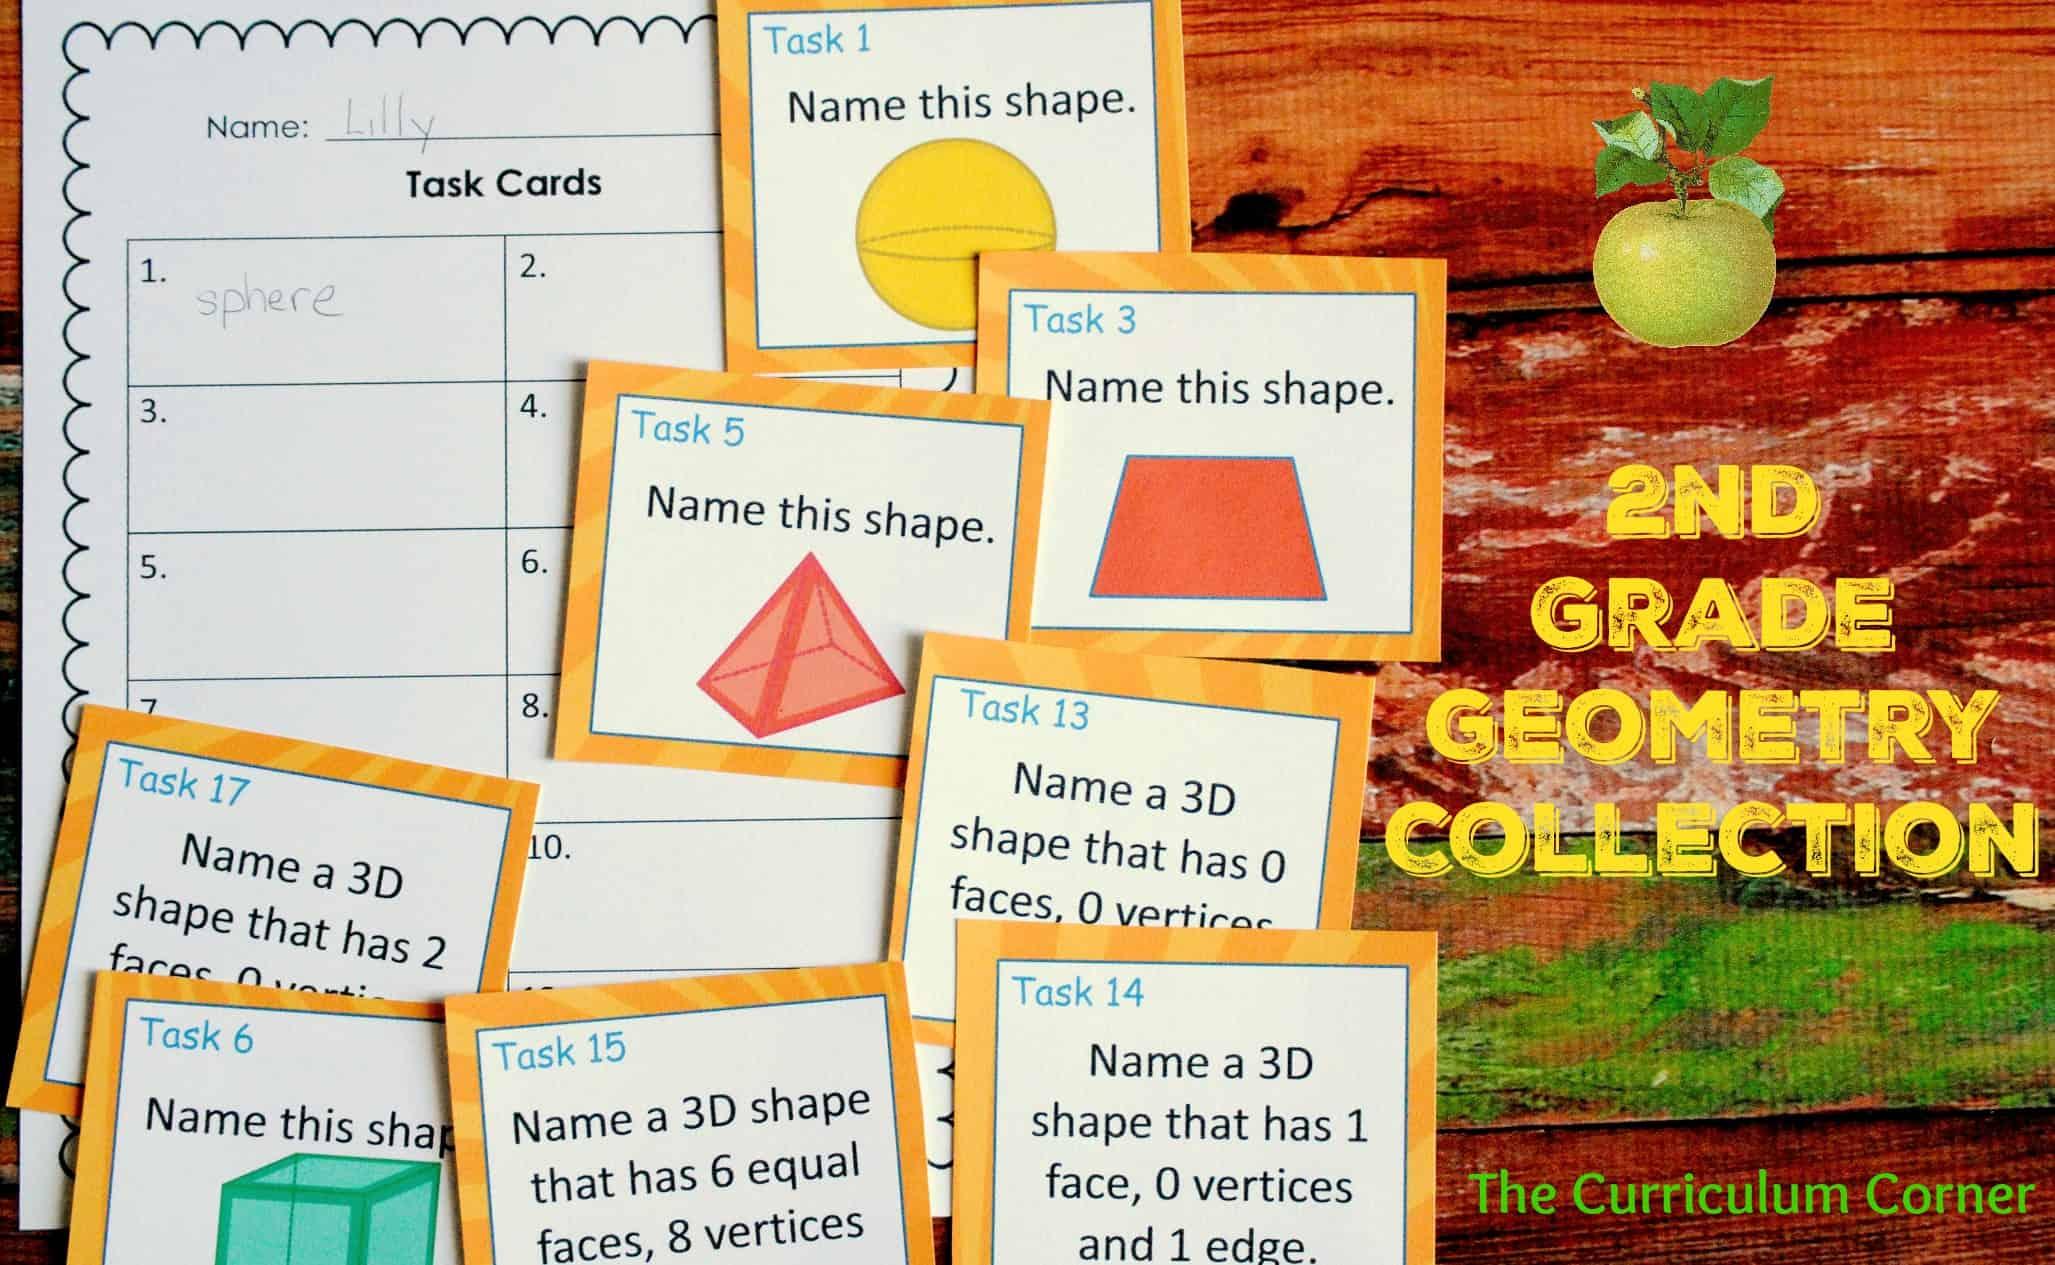 2nd Grade Geometry - The Curriculum Corner 123 [ 1265 x 2055 Pixel ]